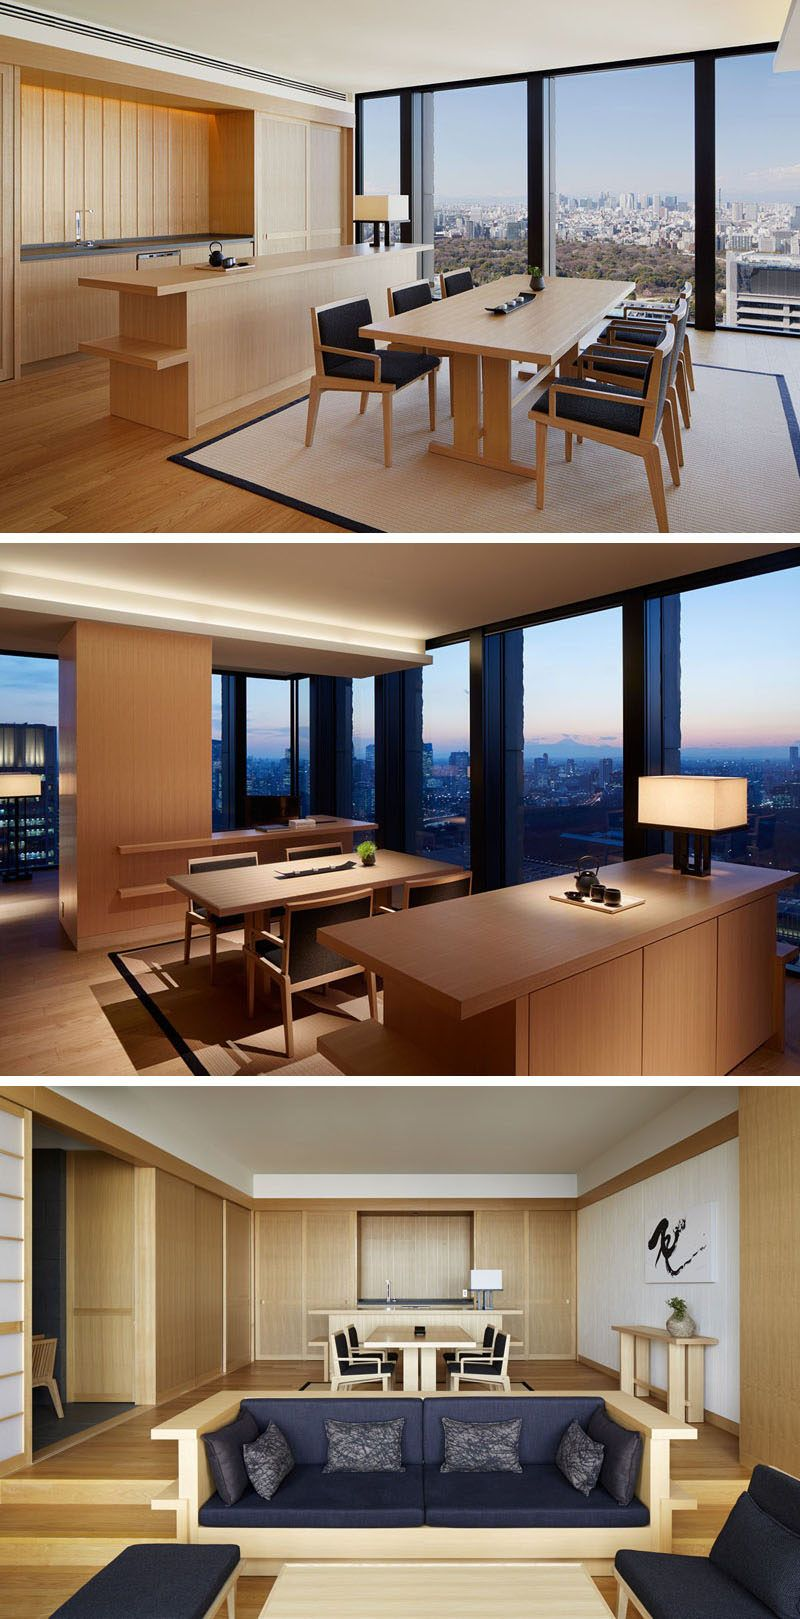 Elements of interior resort design